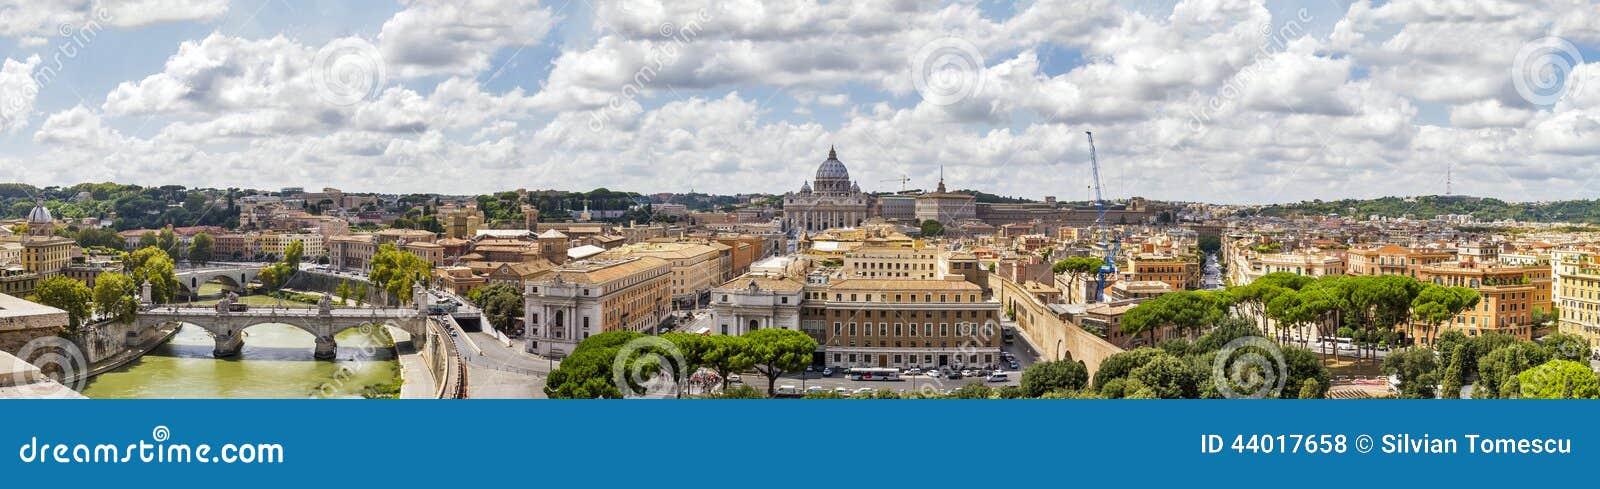 Panorama van Rome, Italië